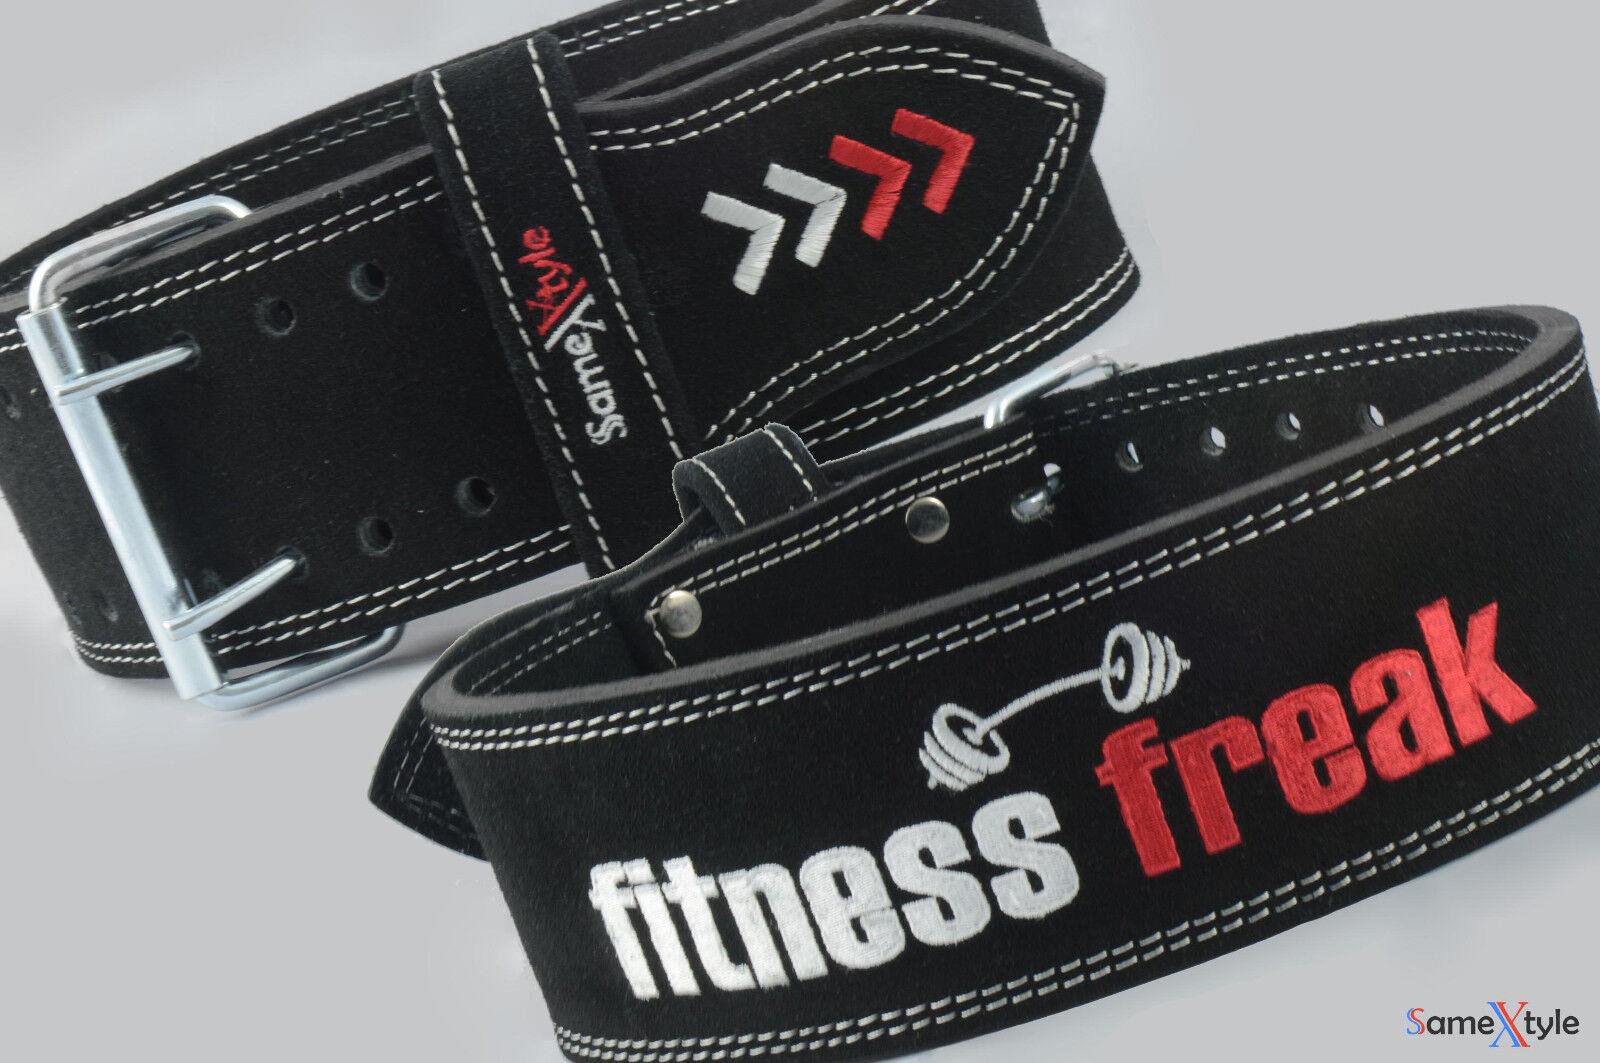 SameXtyle Fitness Freak Weightlifting corpocostruzione Gym energialift Leather Belt 4